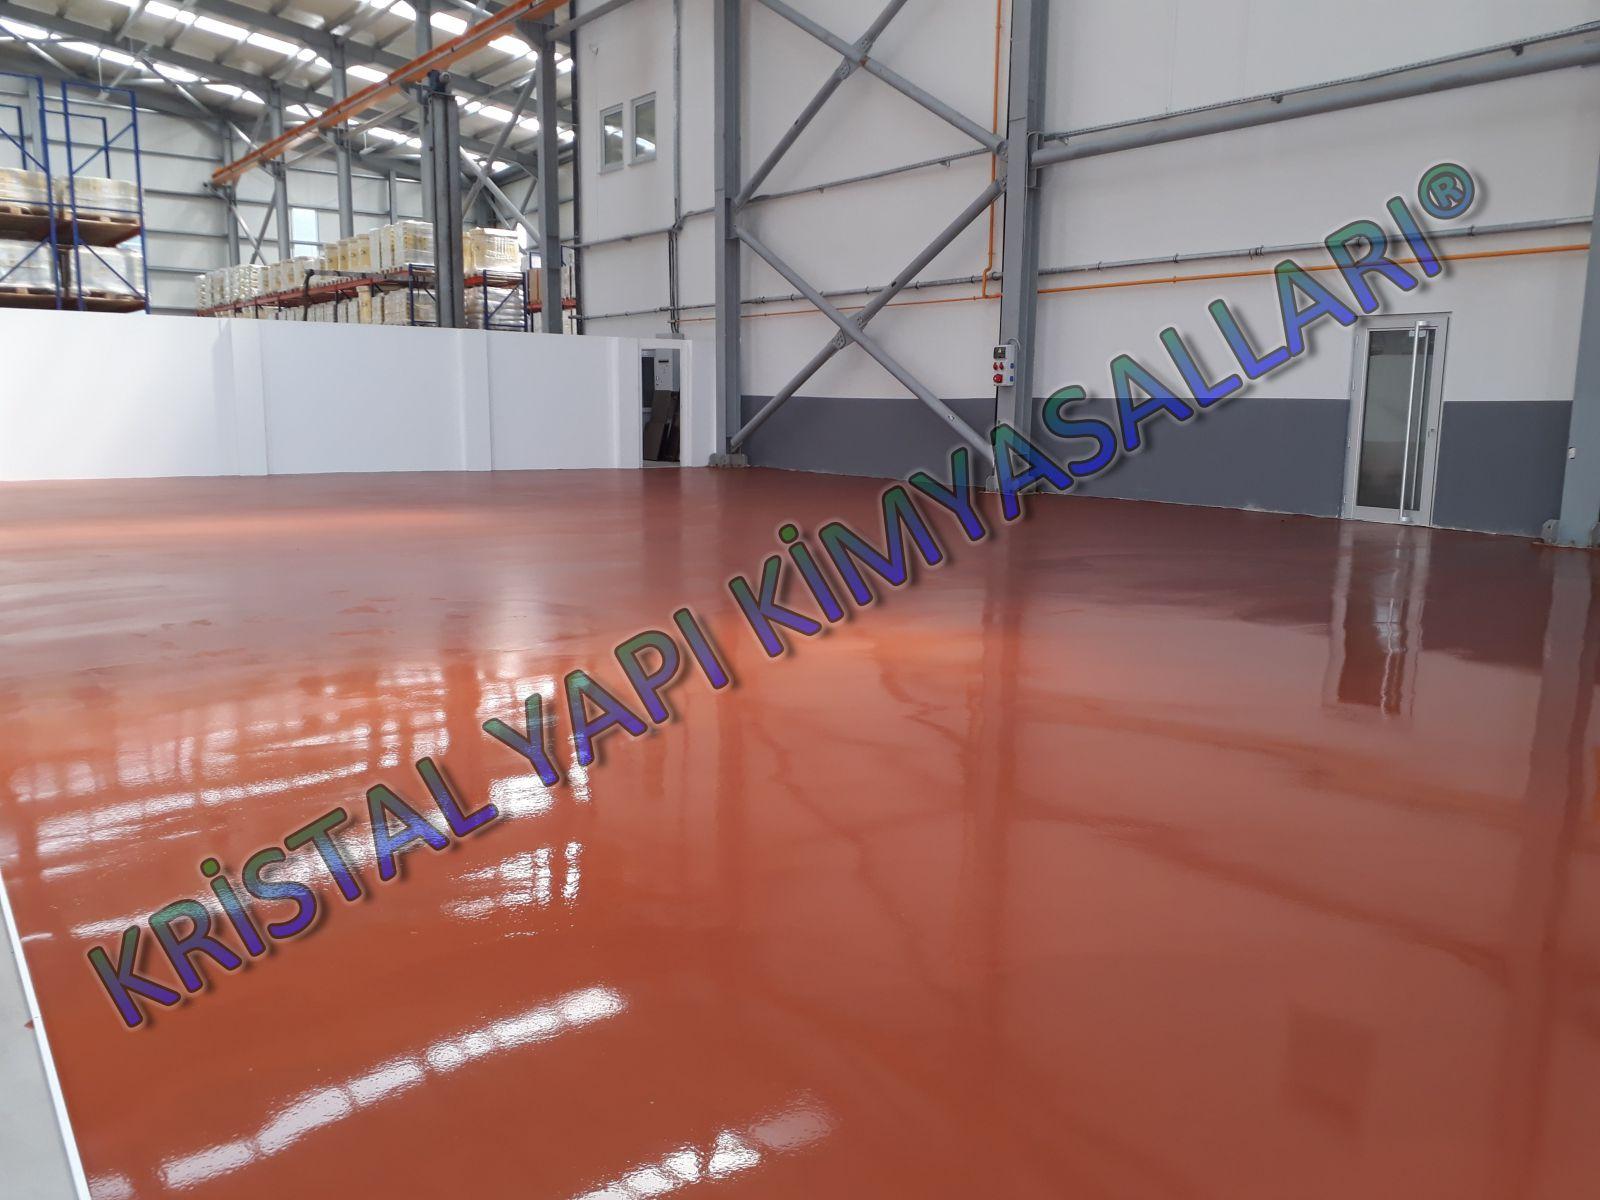 Renkli Mikro Beton, renkli mikro beton uygulaması, mikro beton renkleri